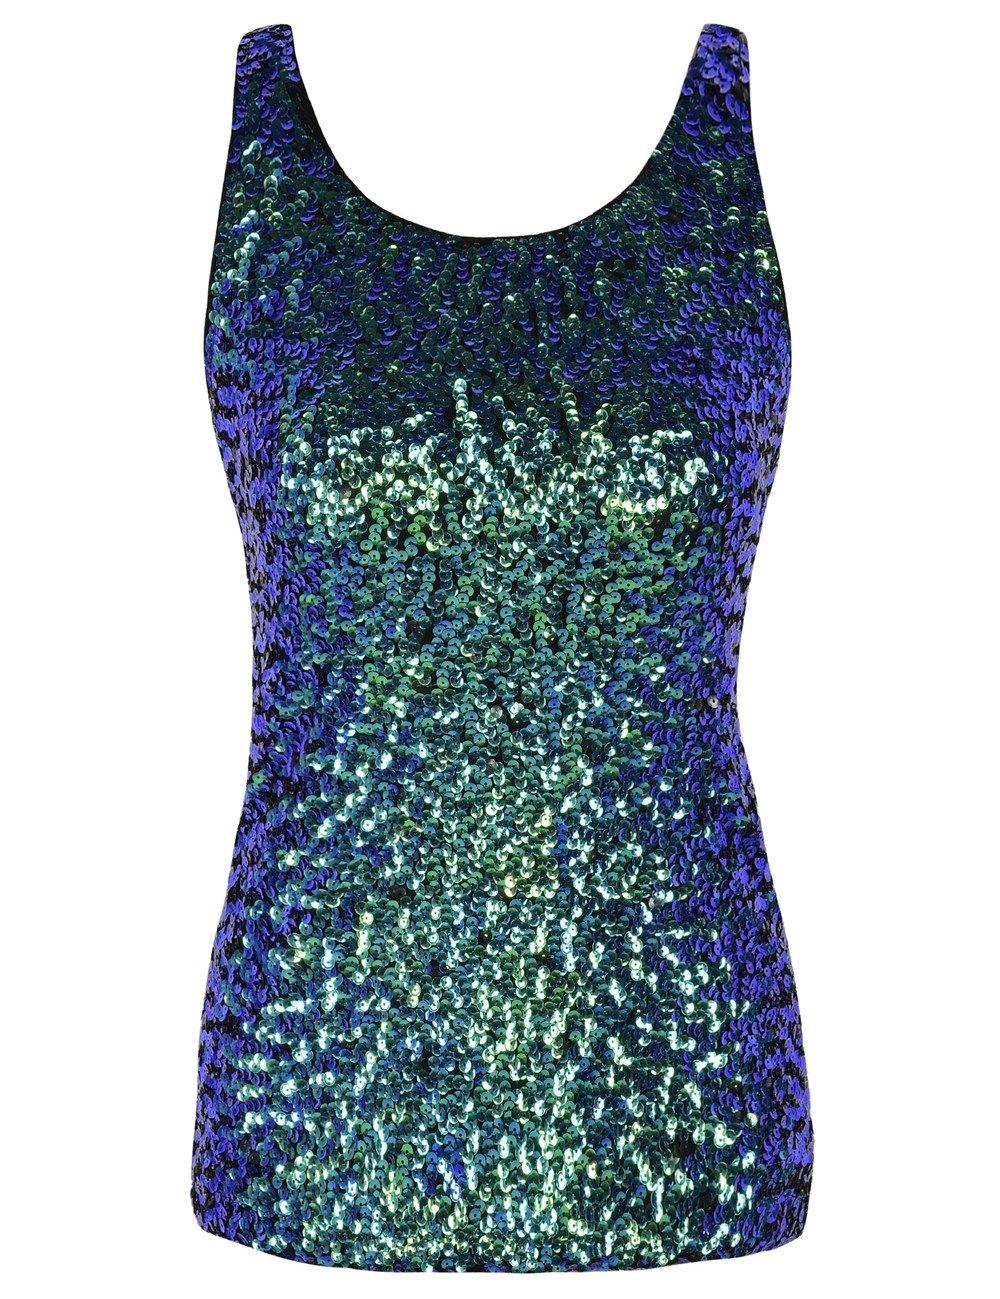 kayamiya Women's 1920S Style Glitter Sequined Vest Tank Tops XL Symphony Green